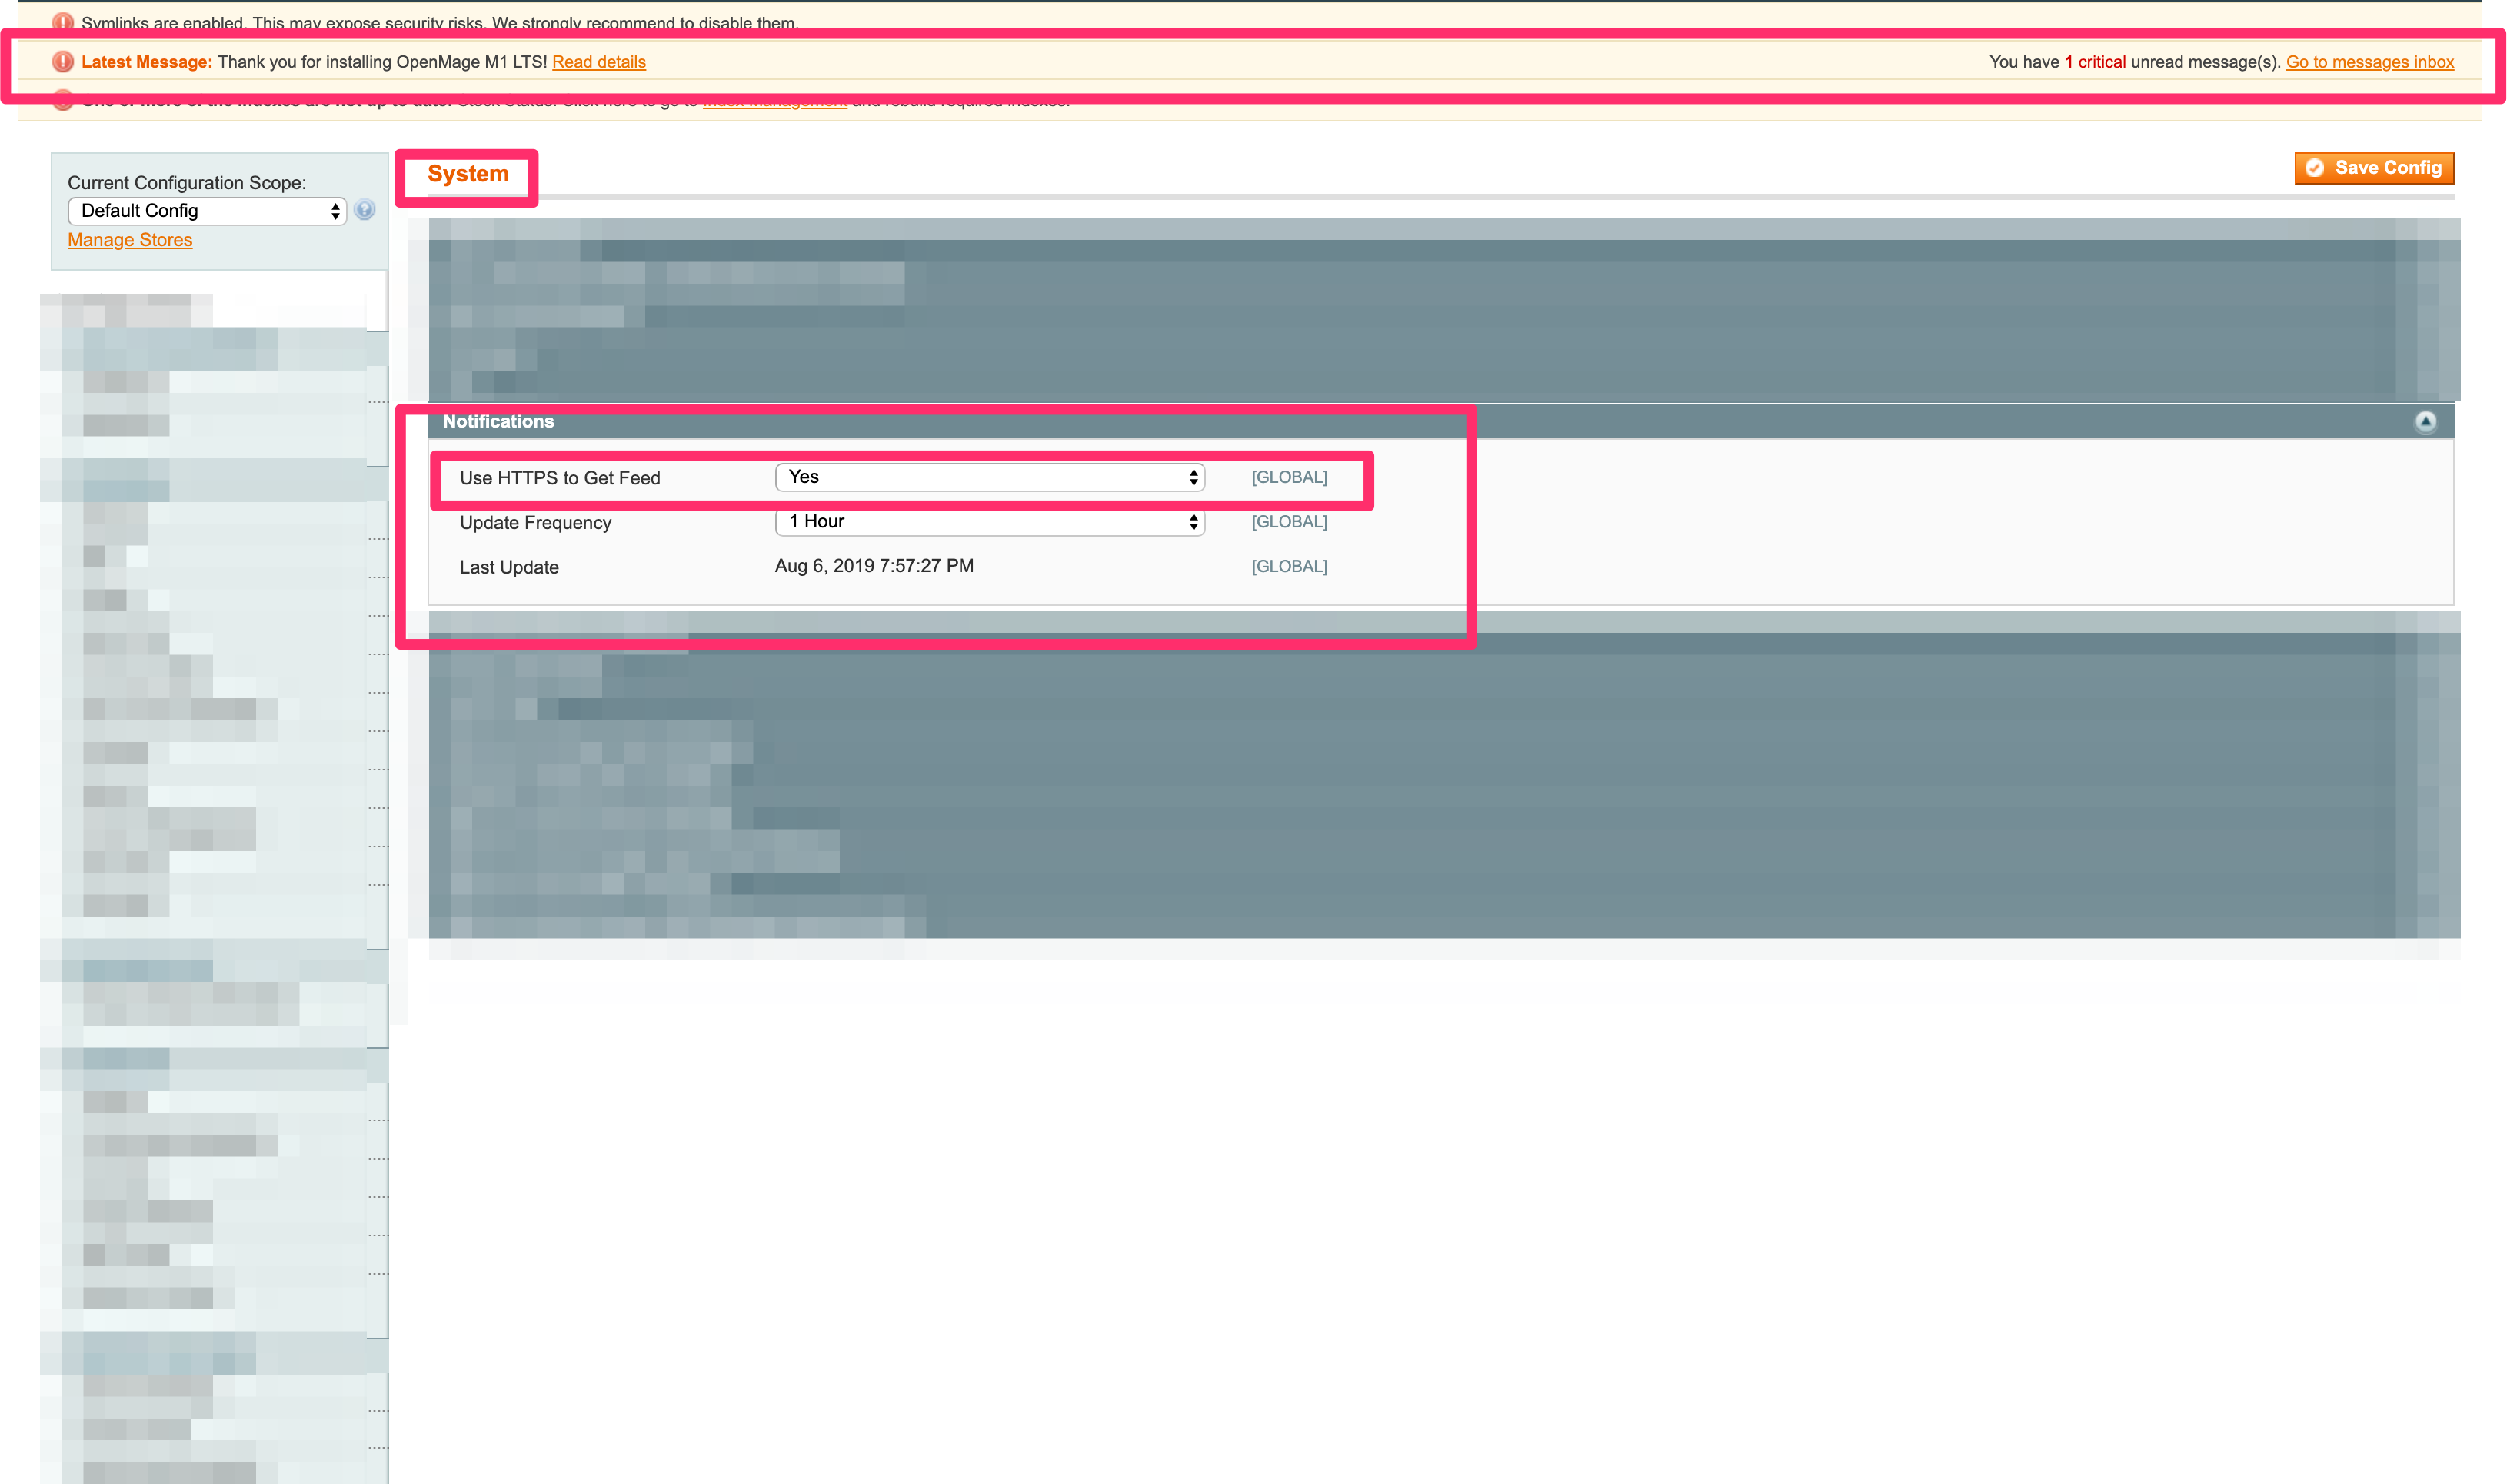 Configuration___System___Magento_Admin